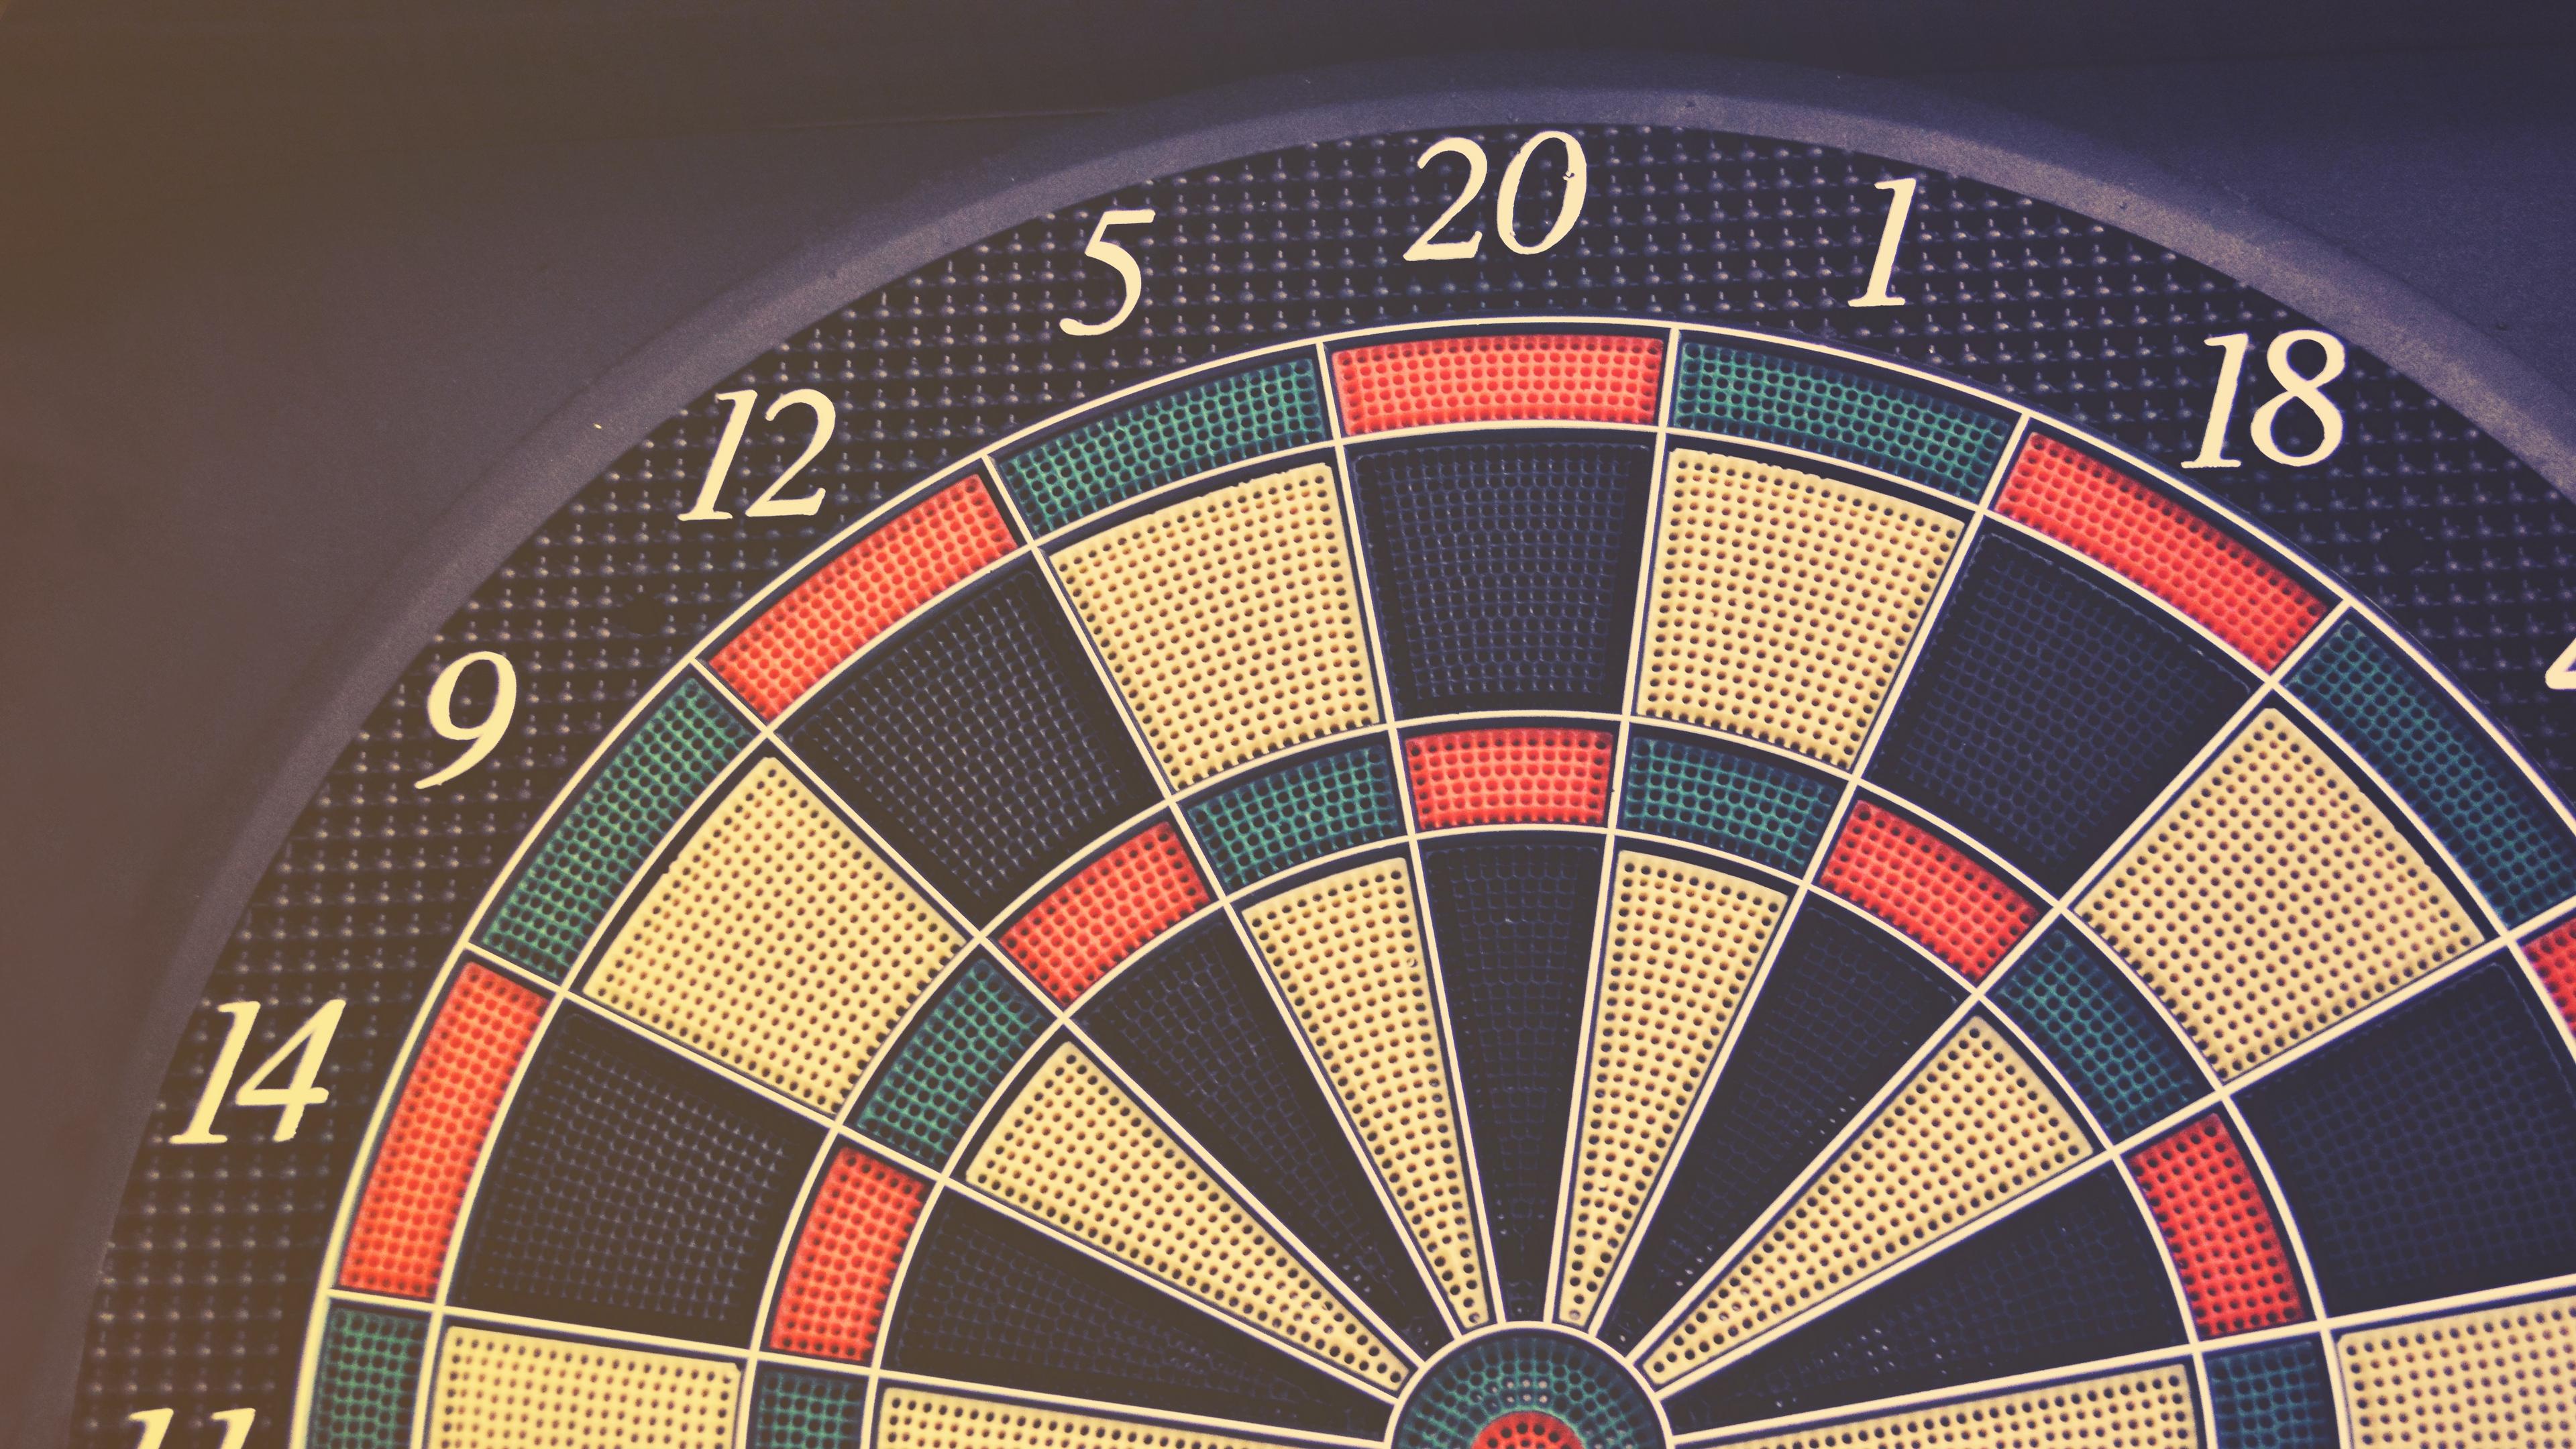 darts target board game throwers arrows tungsten 4k 1540061891 - darts, target, board game, throwers, arrows, tungsten 4k - Target, darts, board game